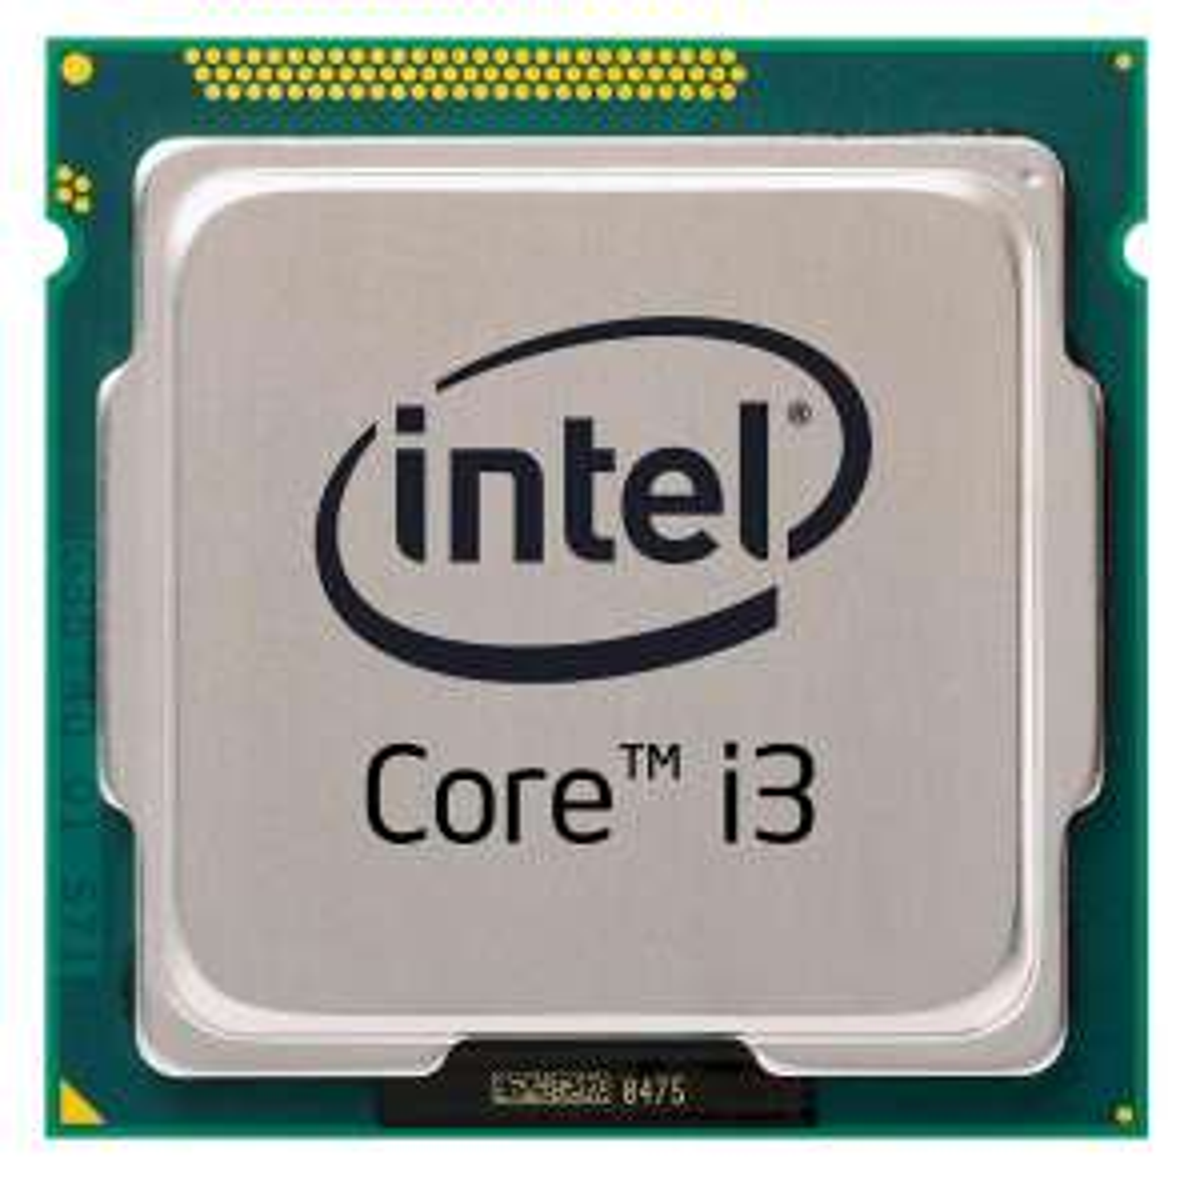 Processeur Intel Core i3 3220 - 3.3 GHz, 2 cœurs, 3 Mo cache, LGA1155 Socket (OEM)